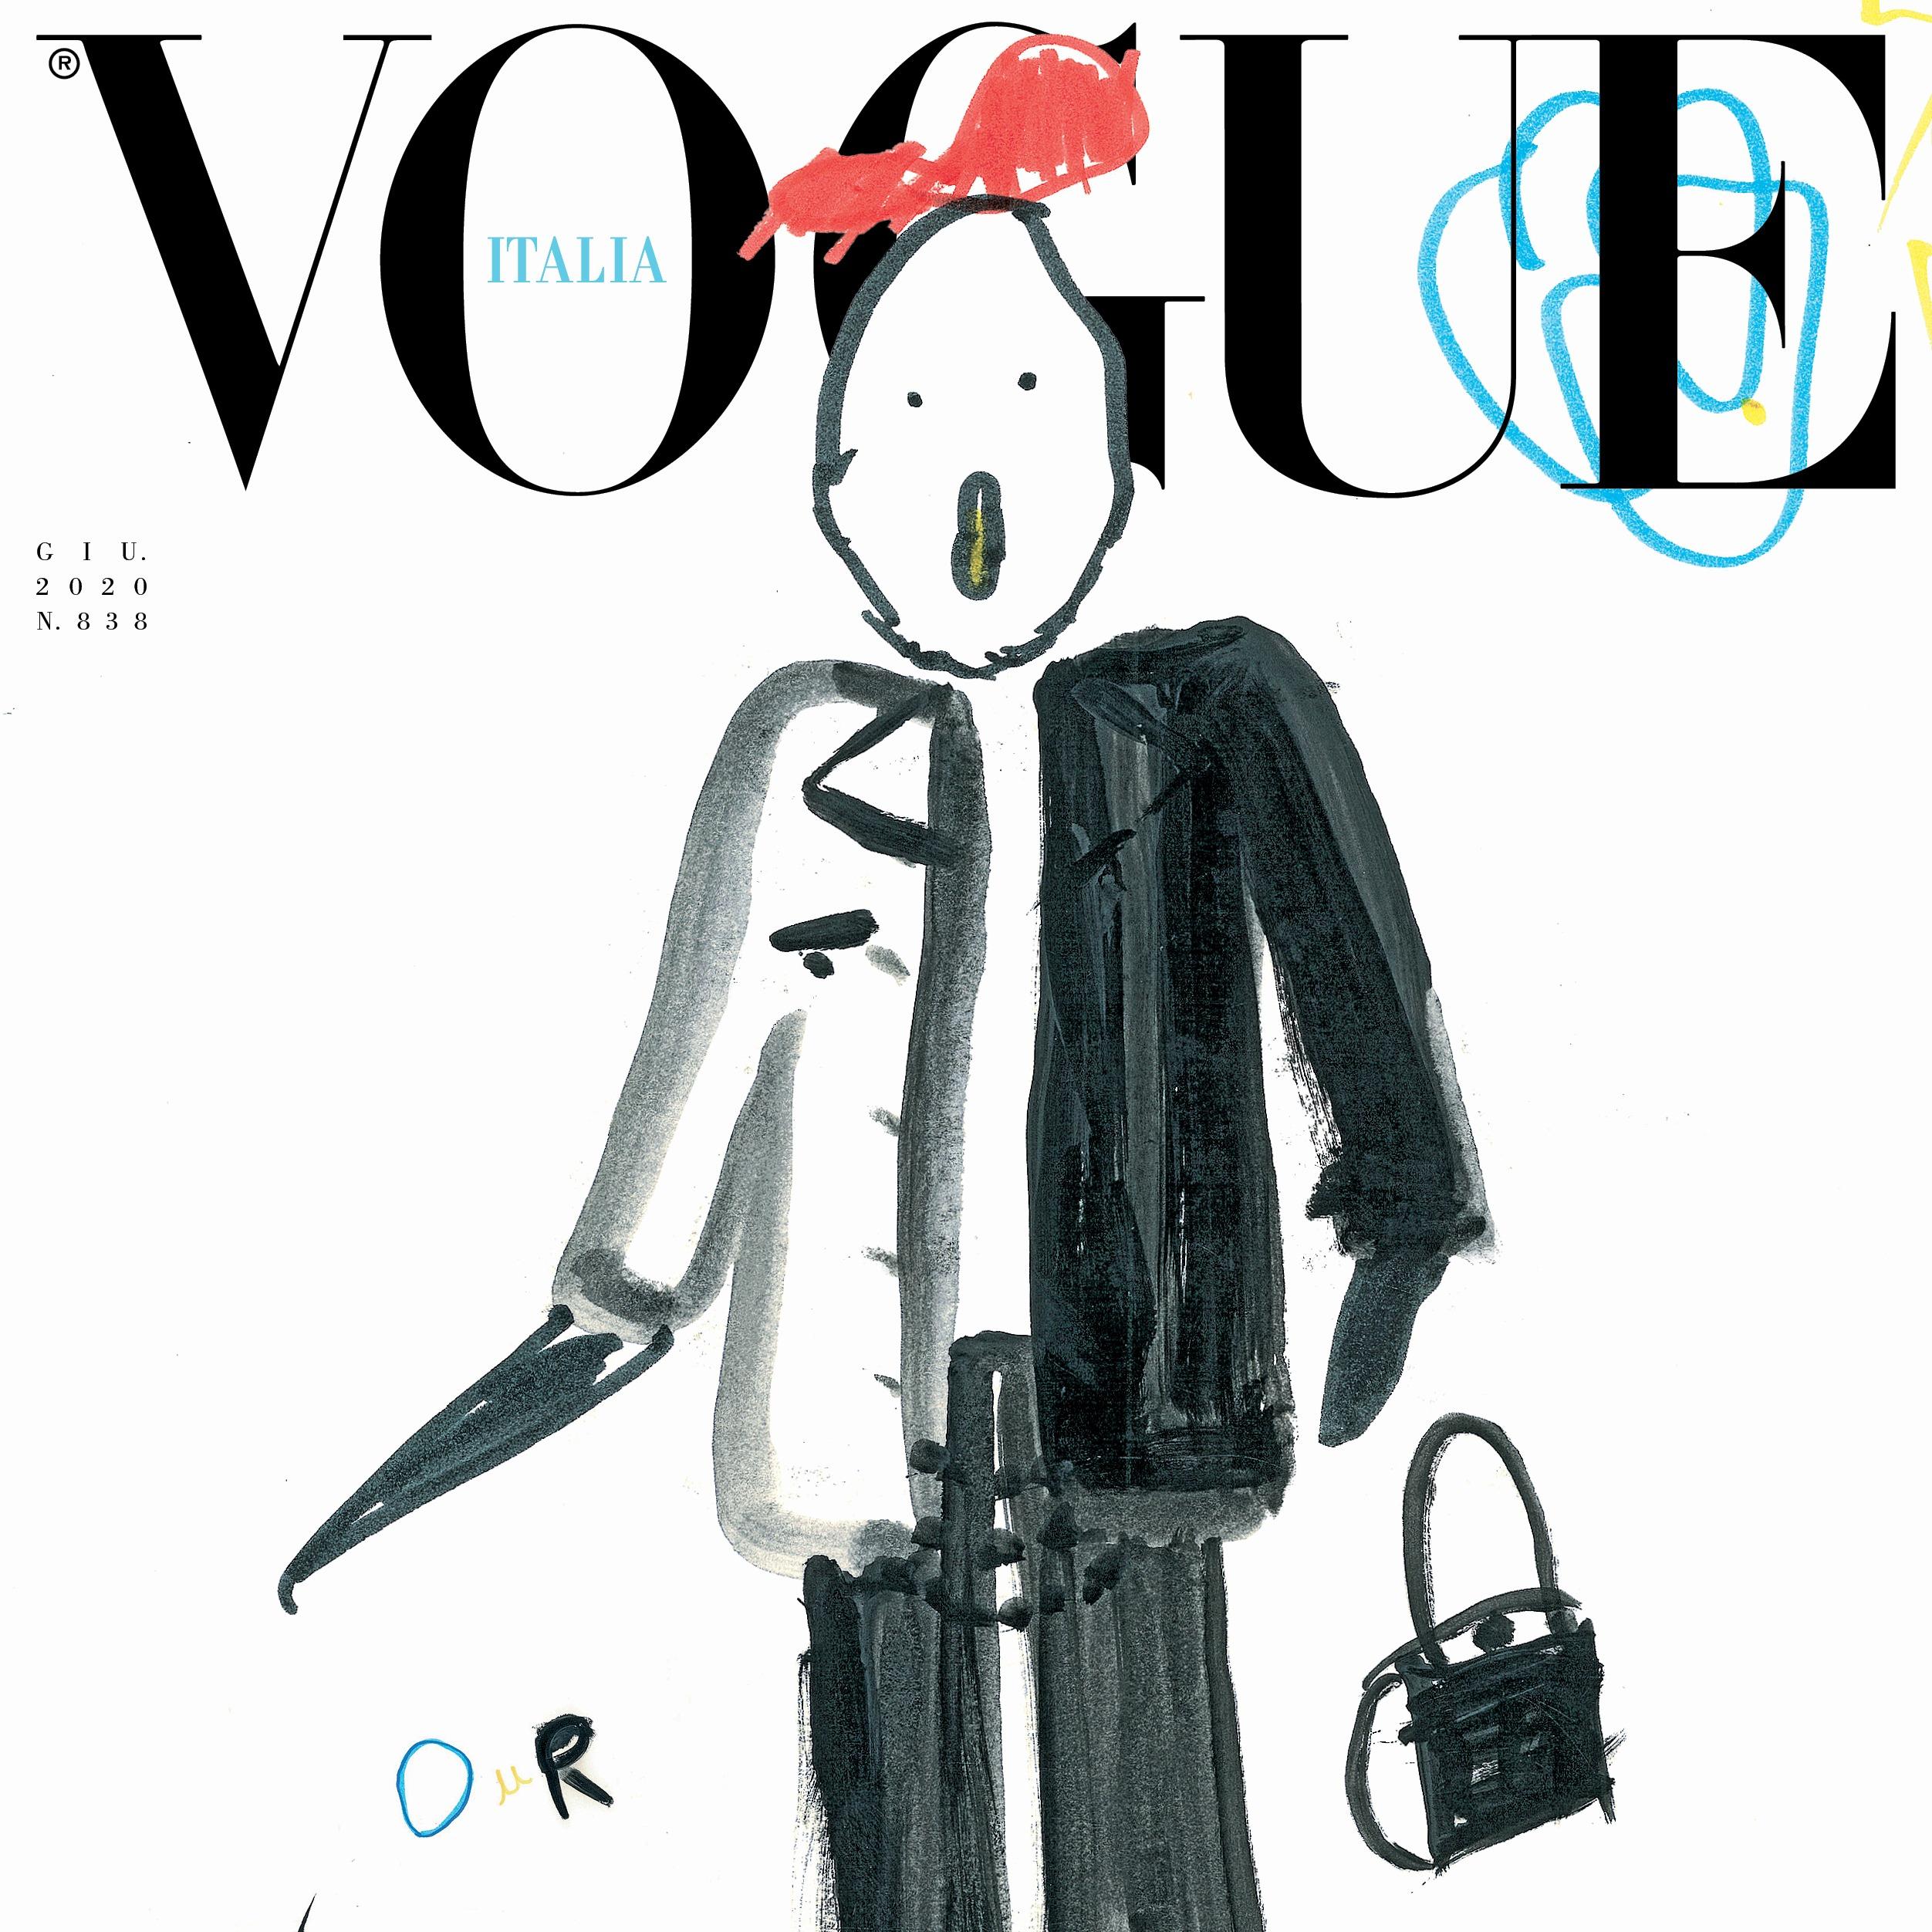 Condé Nast - Children take over Vogue Italia's June issue